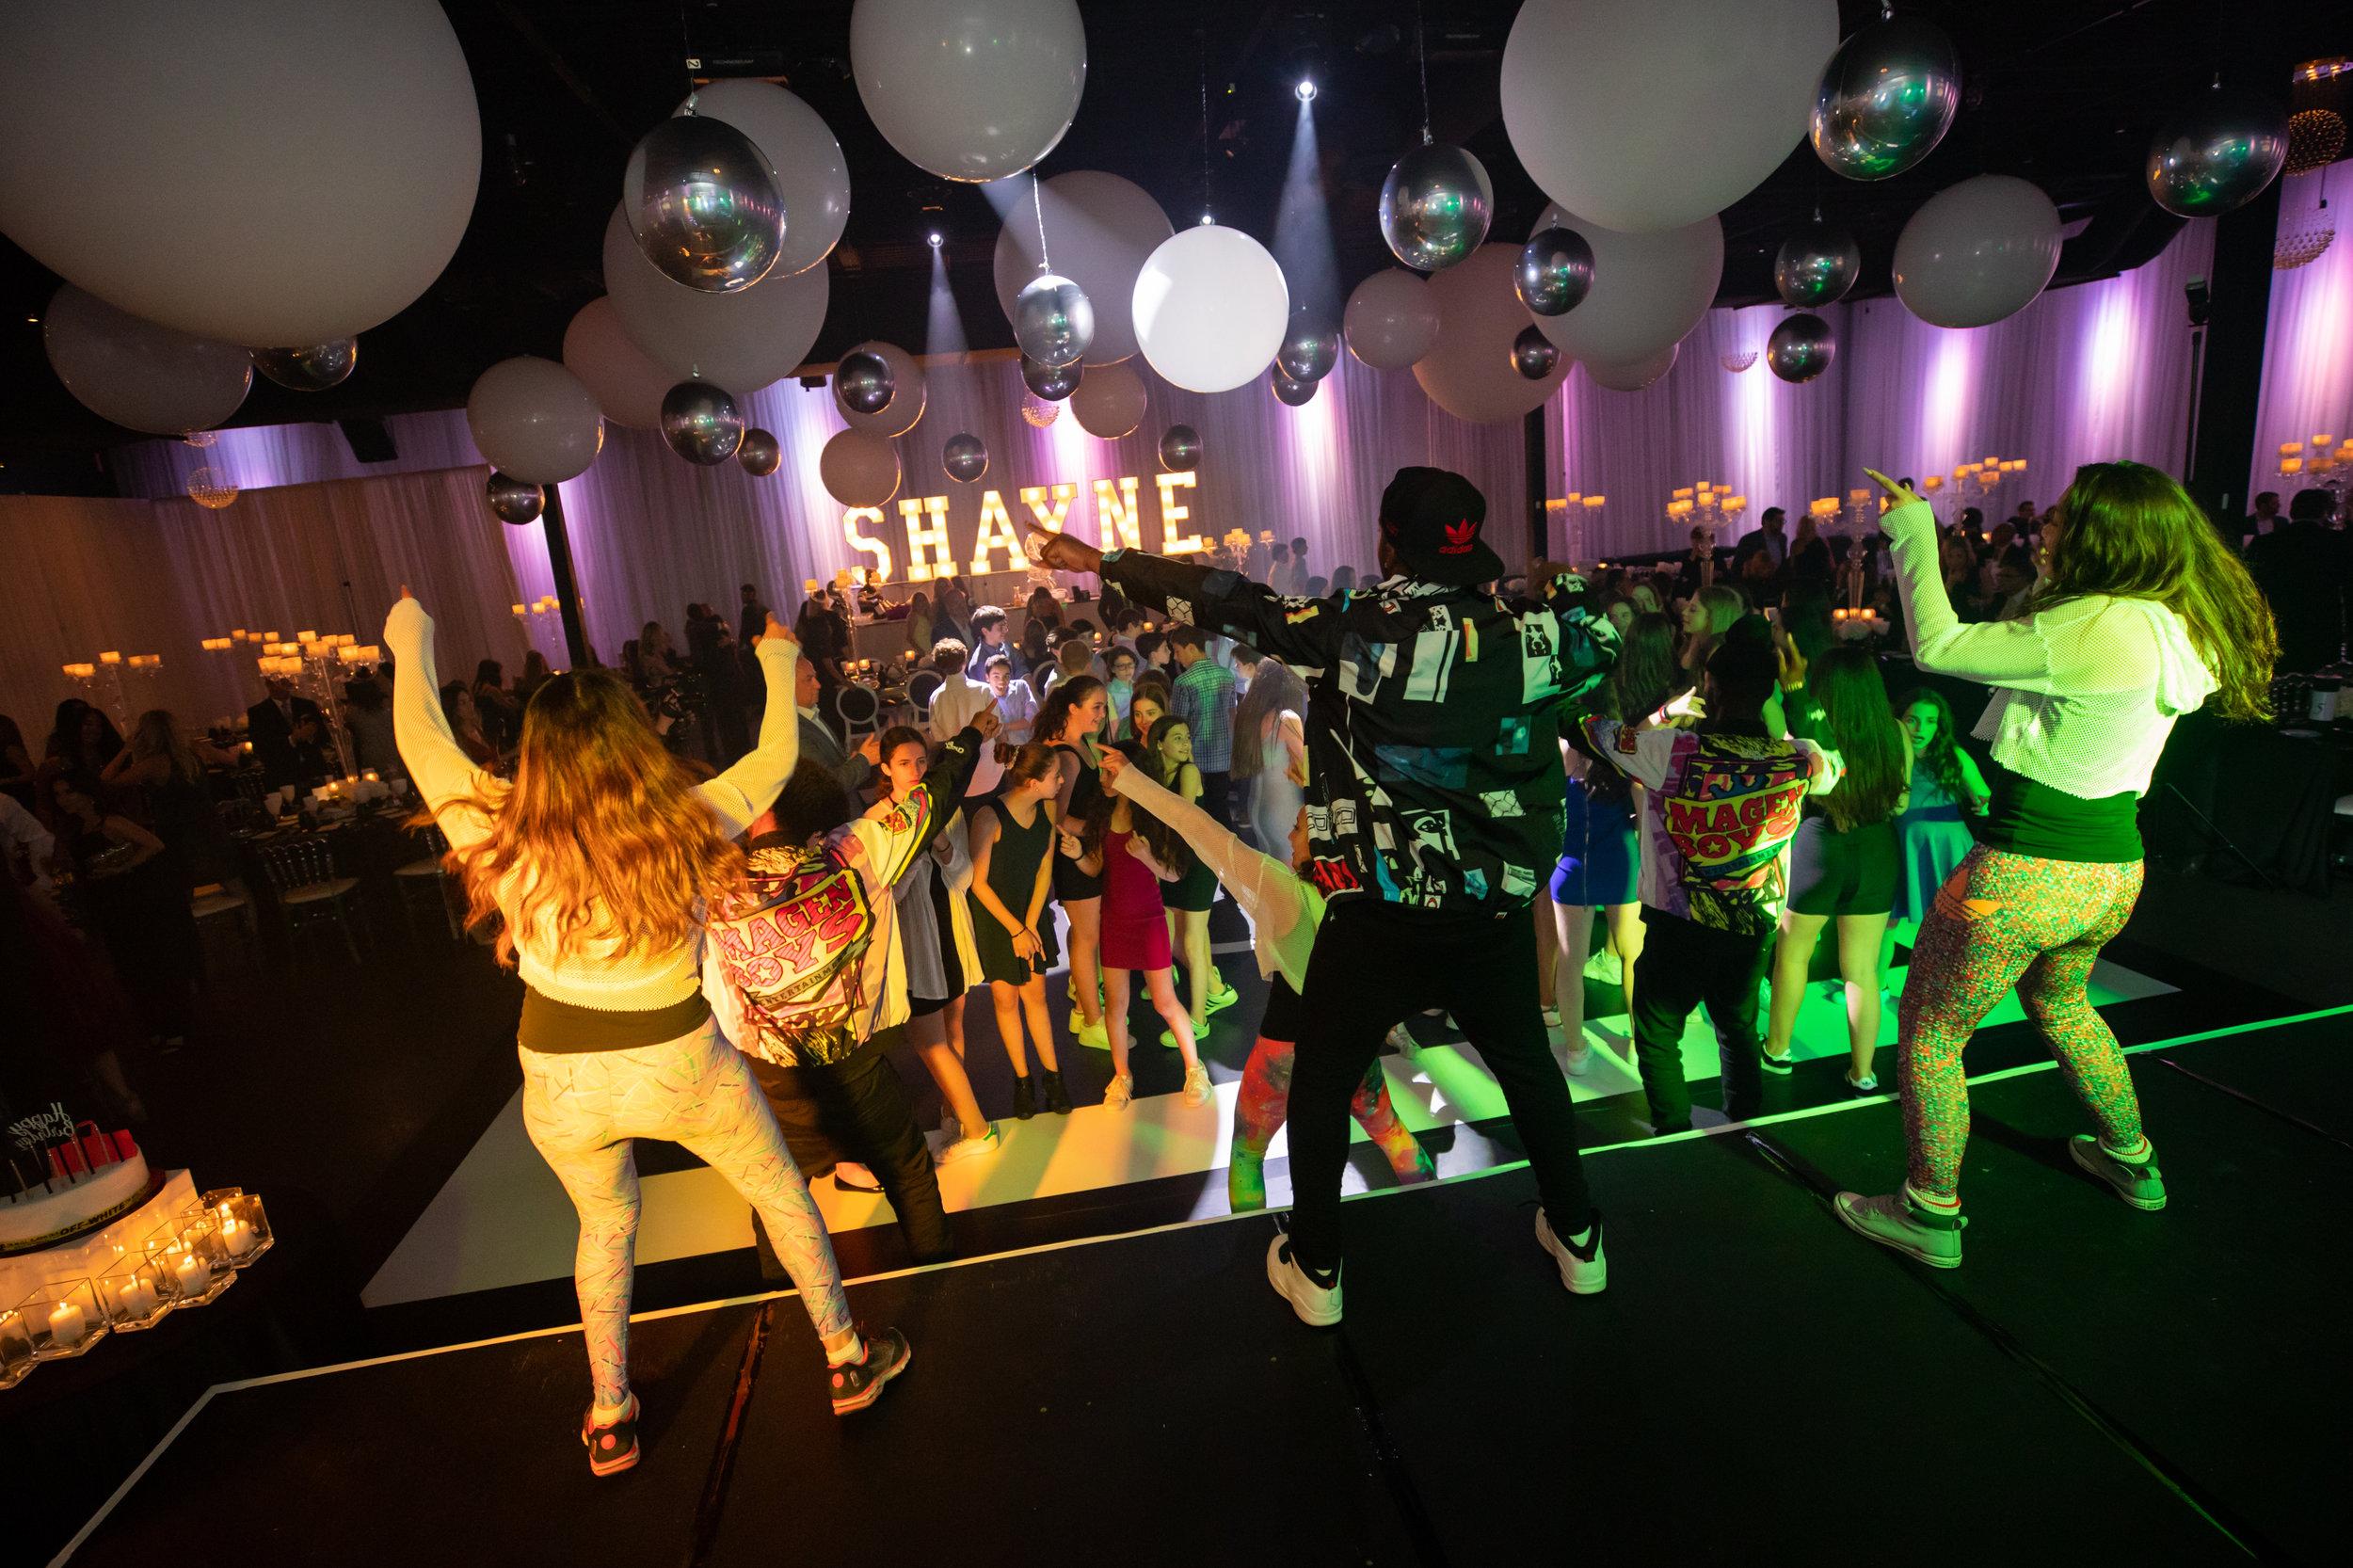 Shayne - Party-0375.jpg